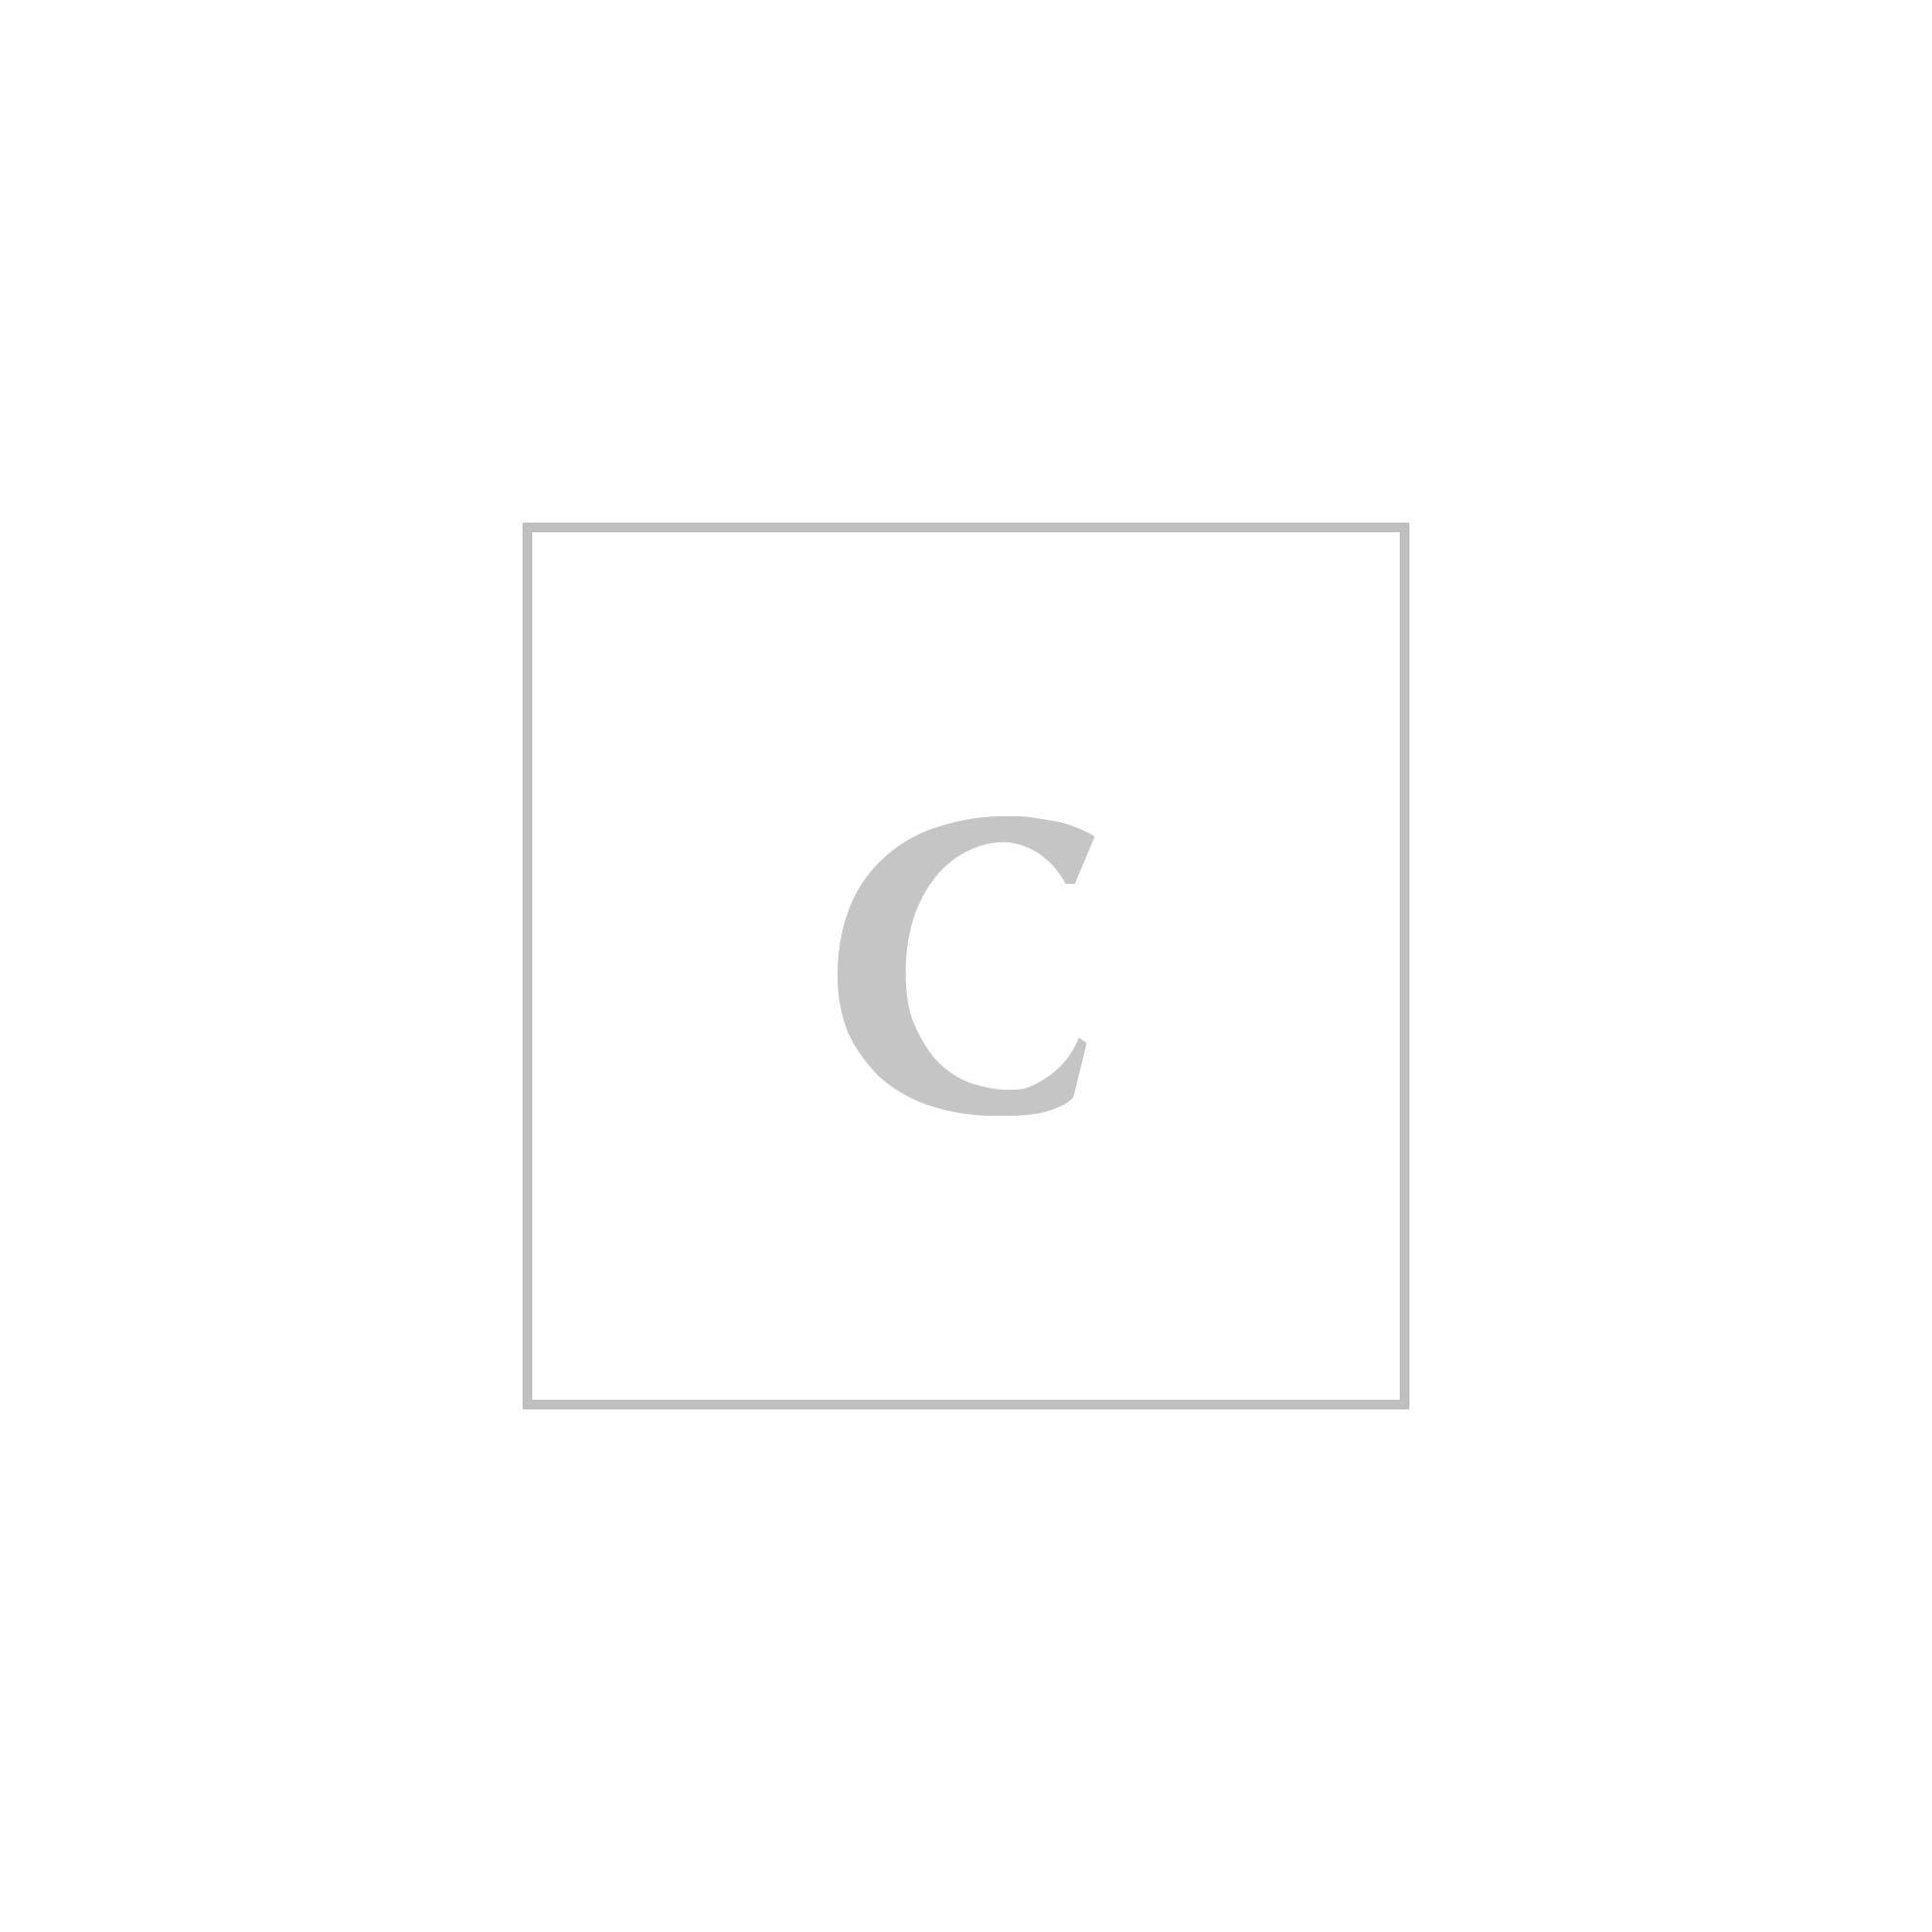 dolce & gabbana borse donna borsa monica pelle stampa iguana